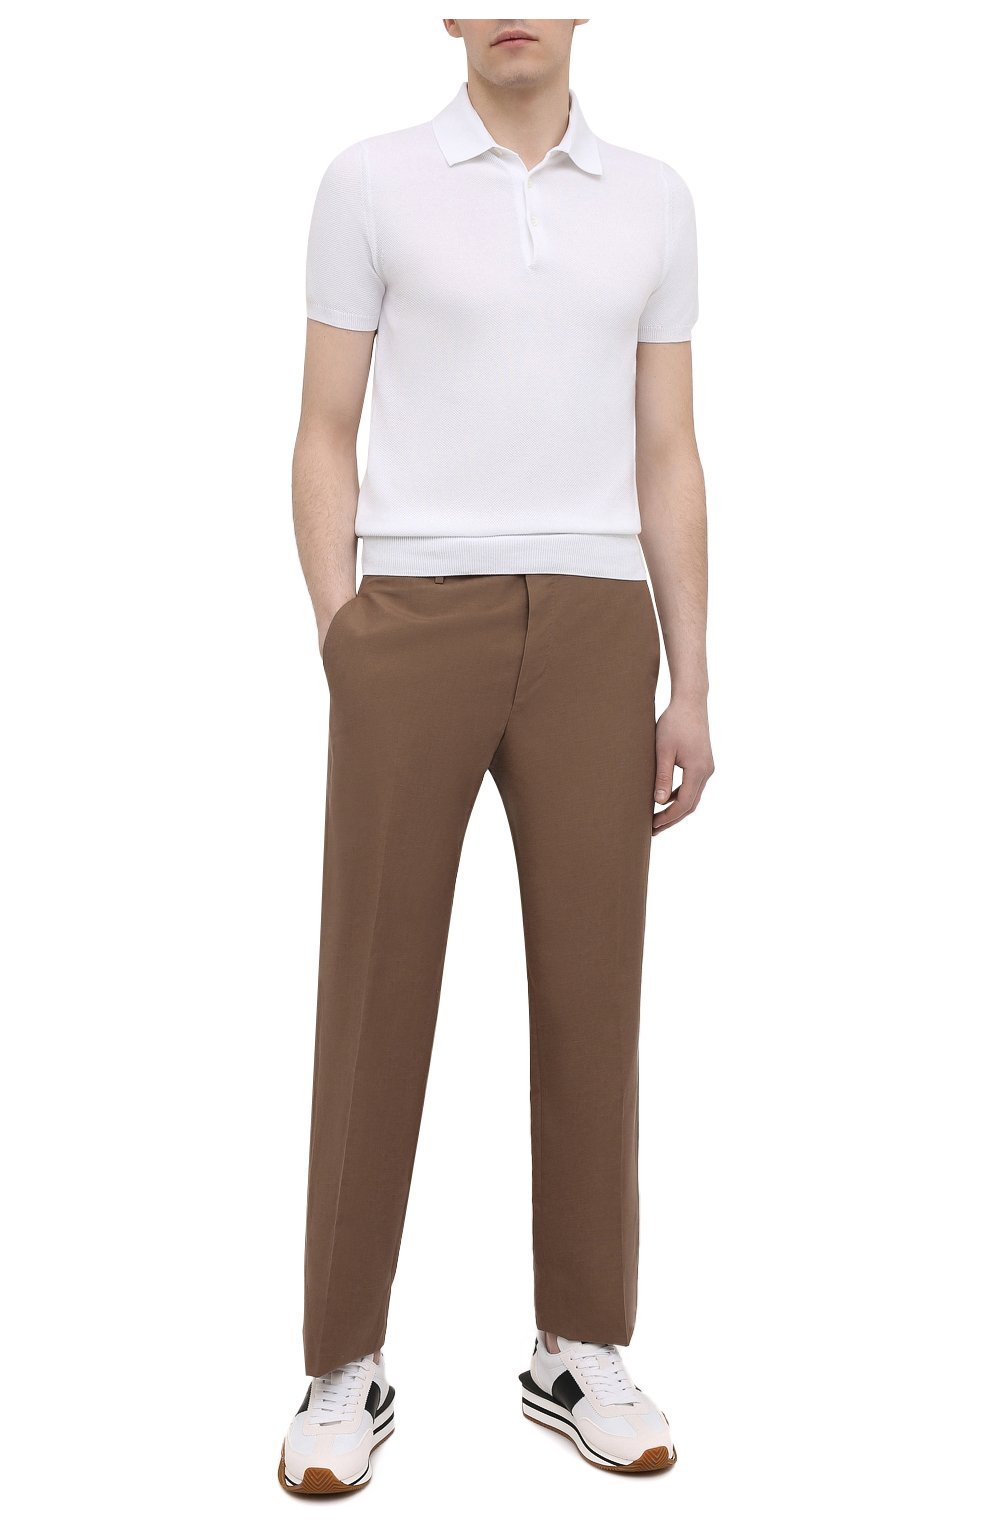 Мужские брюки из шелка и льна TOM FORD коричневого цвета, арт. 976R15/759242   Фото 2